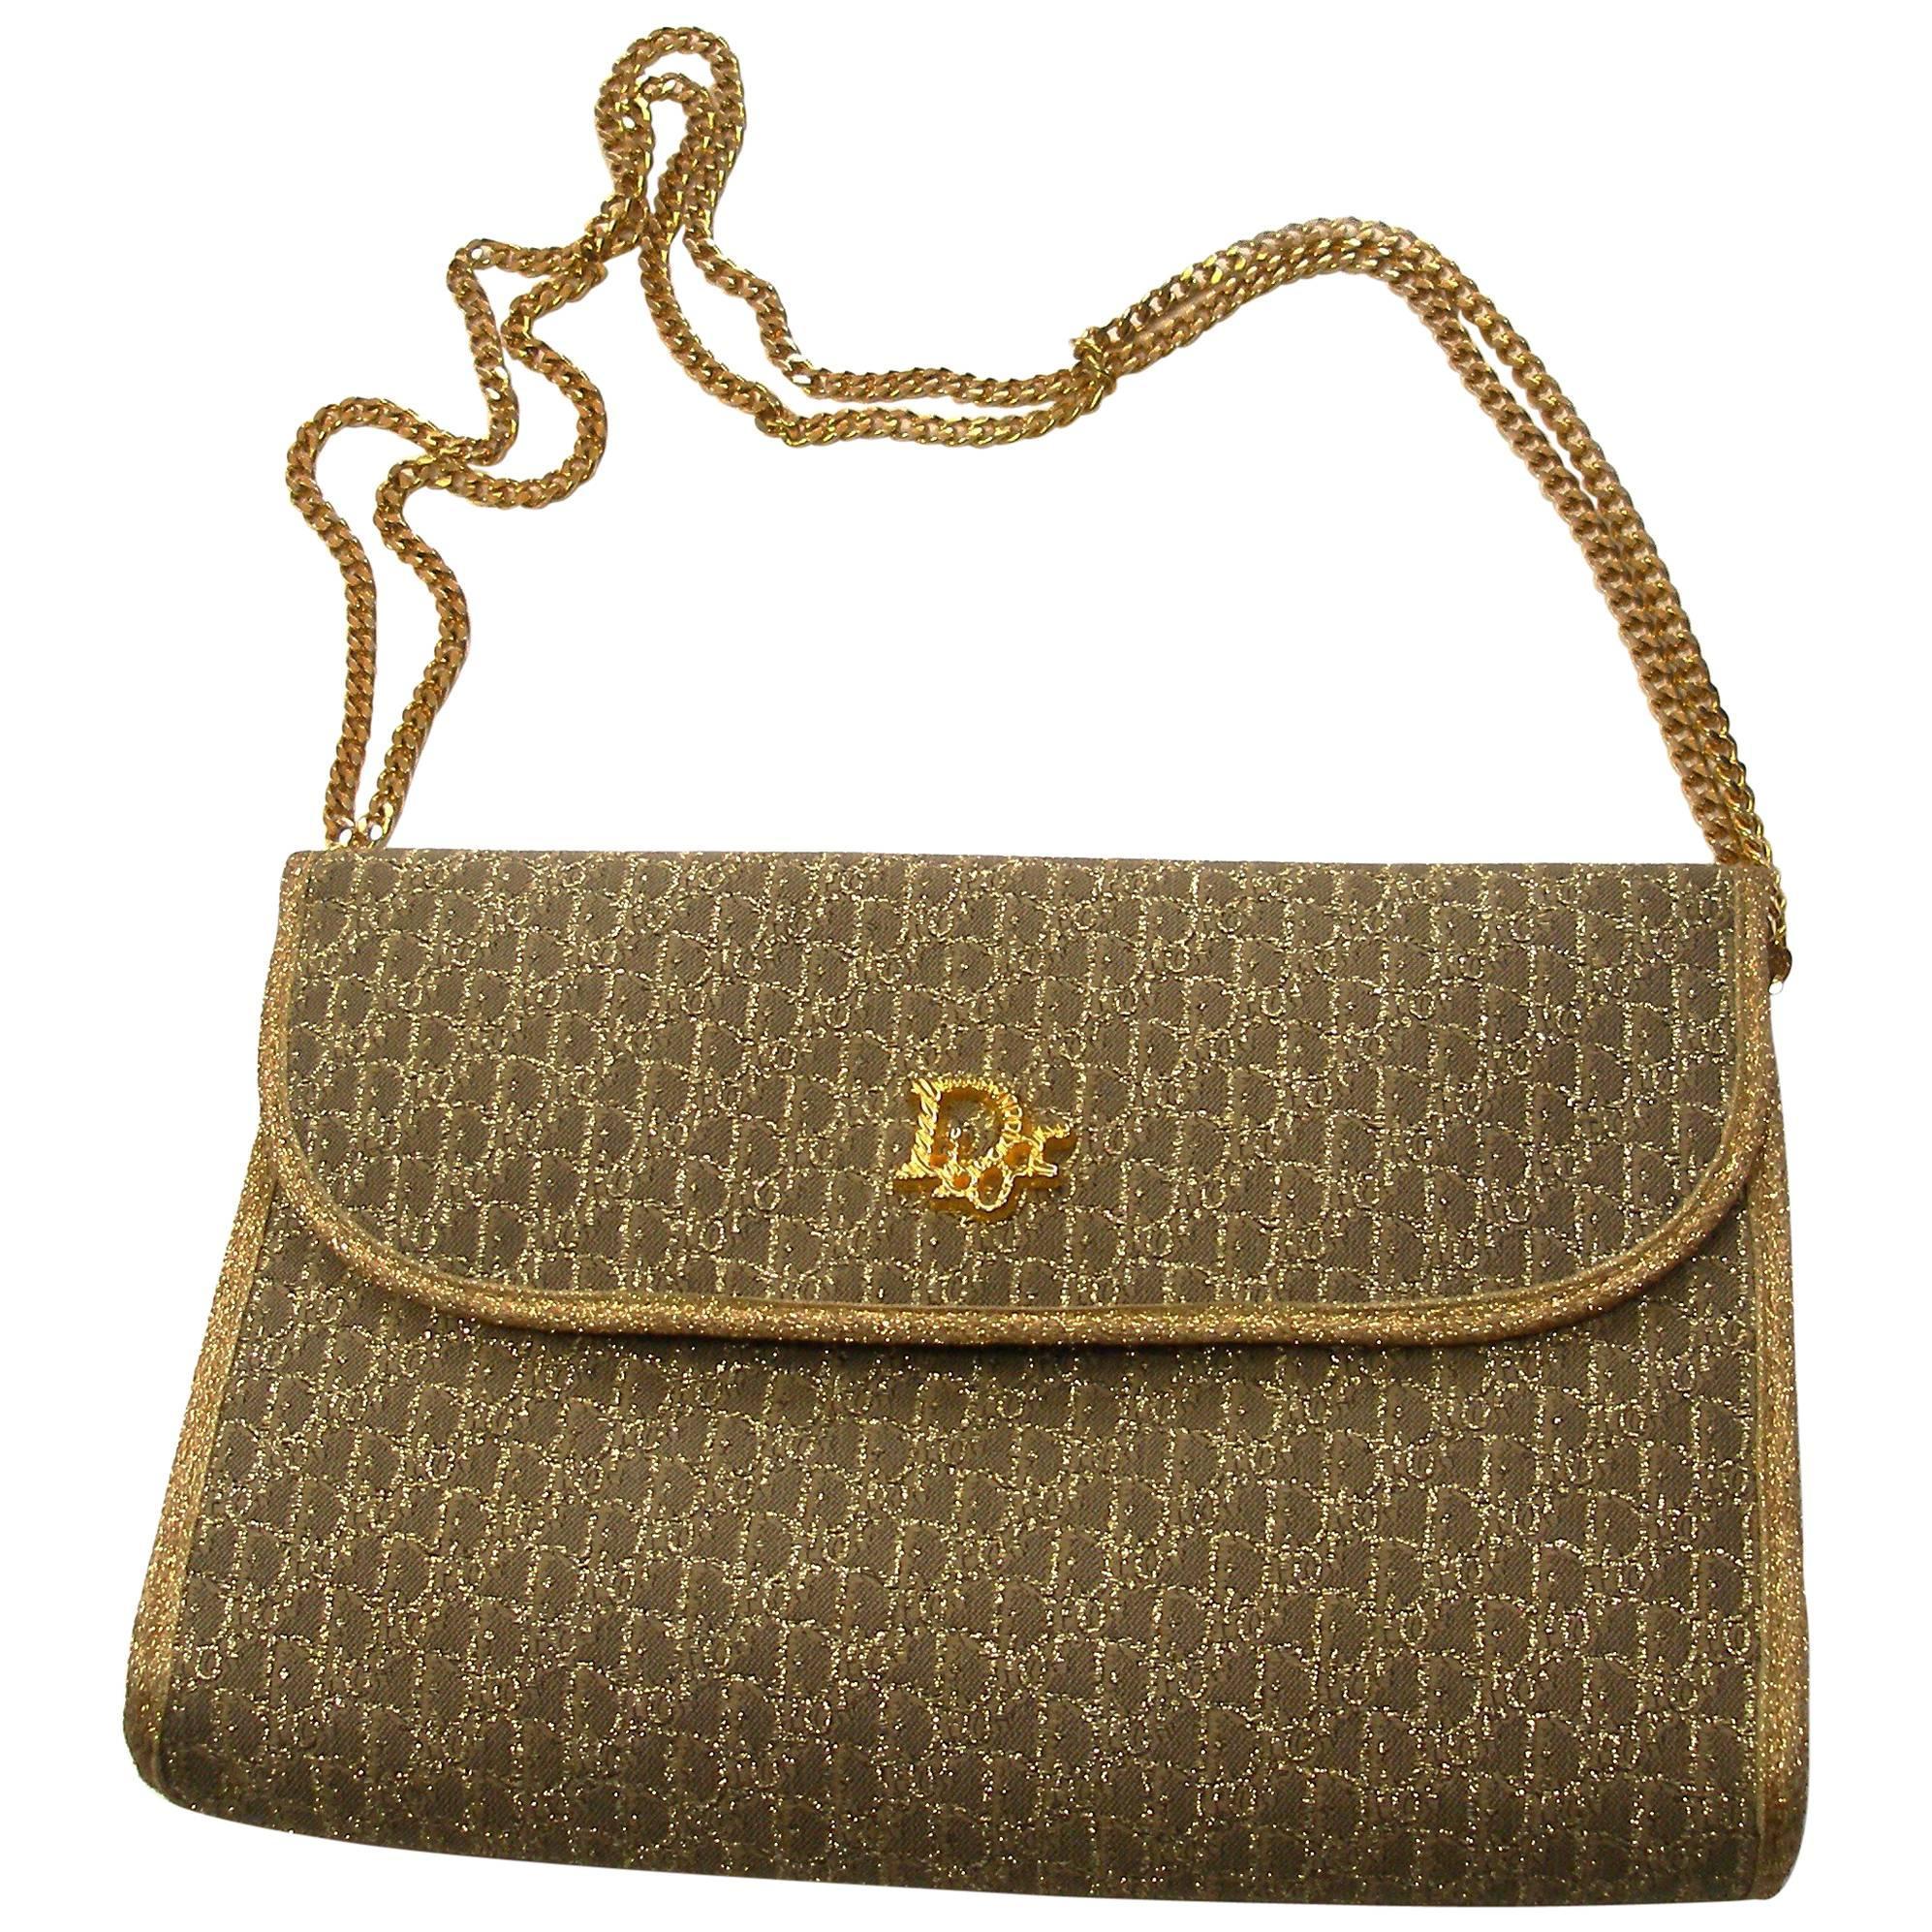 d5bc368a60b8 Vintage Christian Dior Gold Lurex Clutch Handbag at 1stdibs